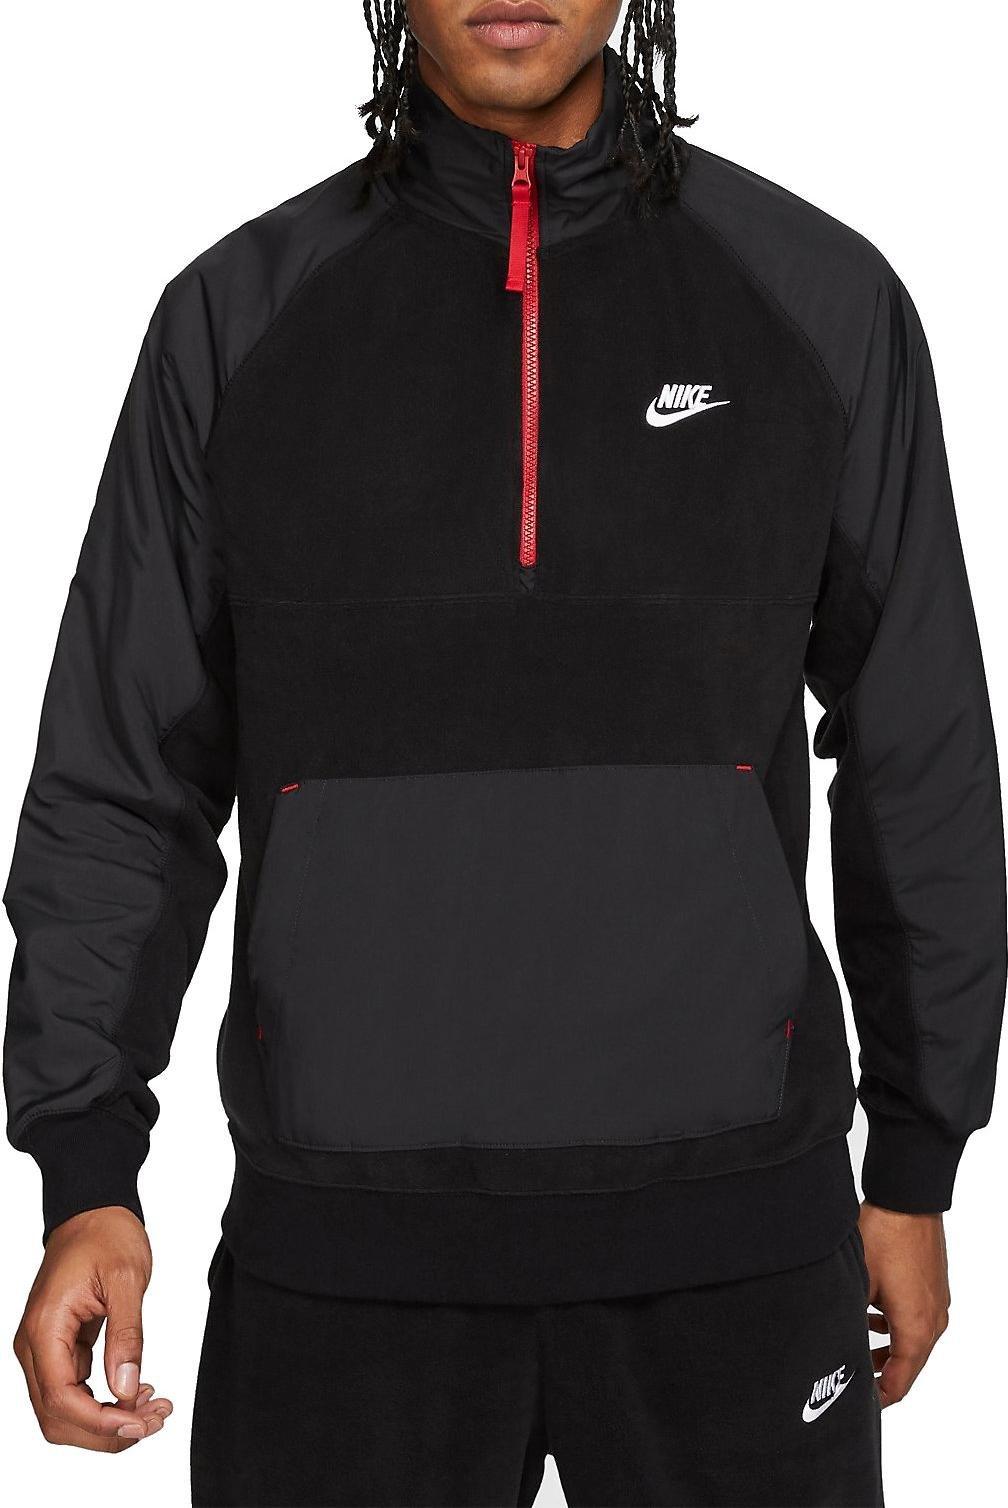 Pánský top s dlouhým rukávem Nike Sportswear